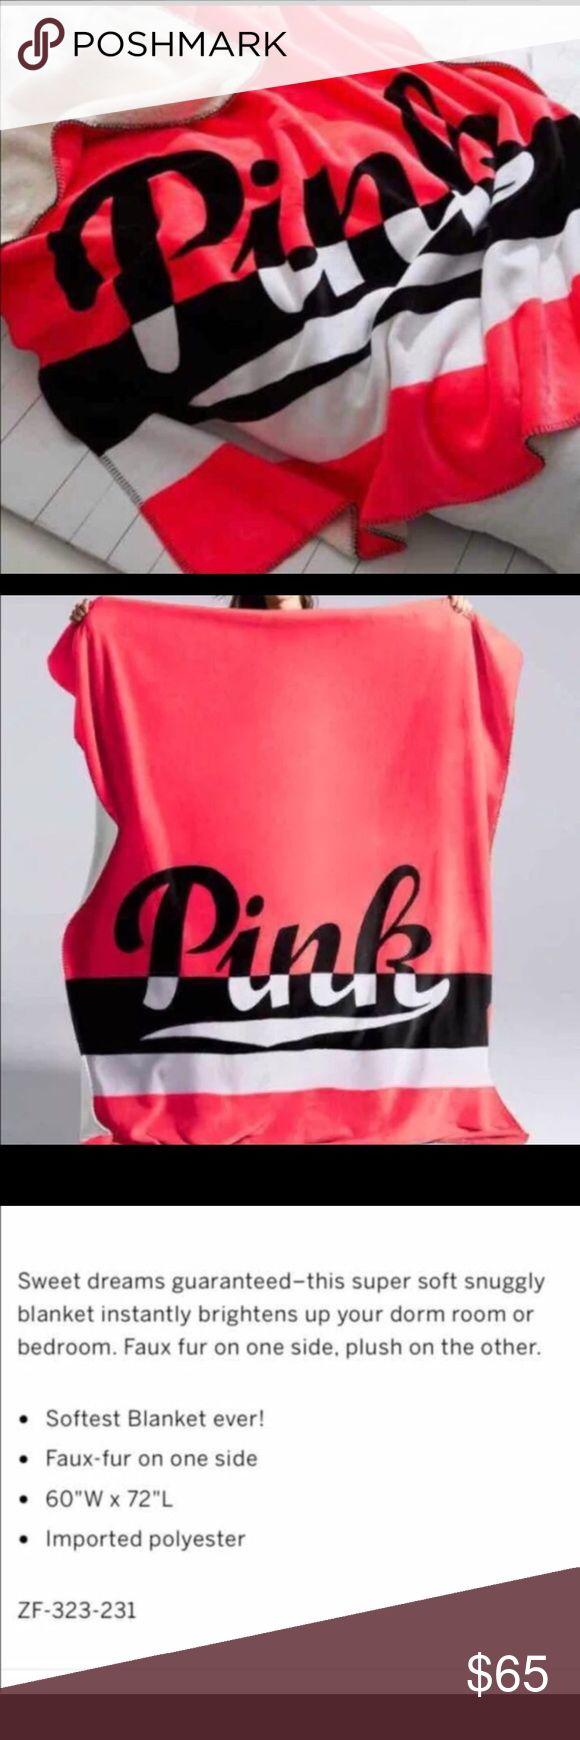 "Pink Victoria Secret Sherpa Blanket Pink Victoria Secret Sherpa Blanket Neon Pink and Black NWT No Trades Size 60""x72"" PINK Victoria's Secret Other"